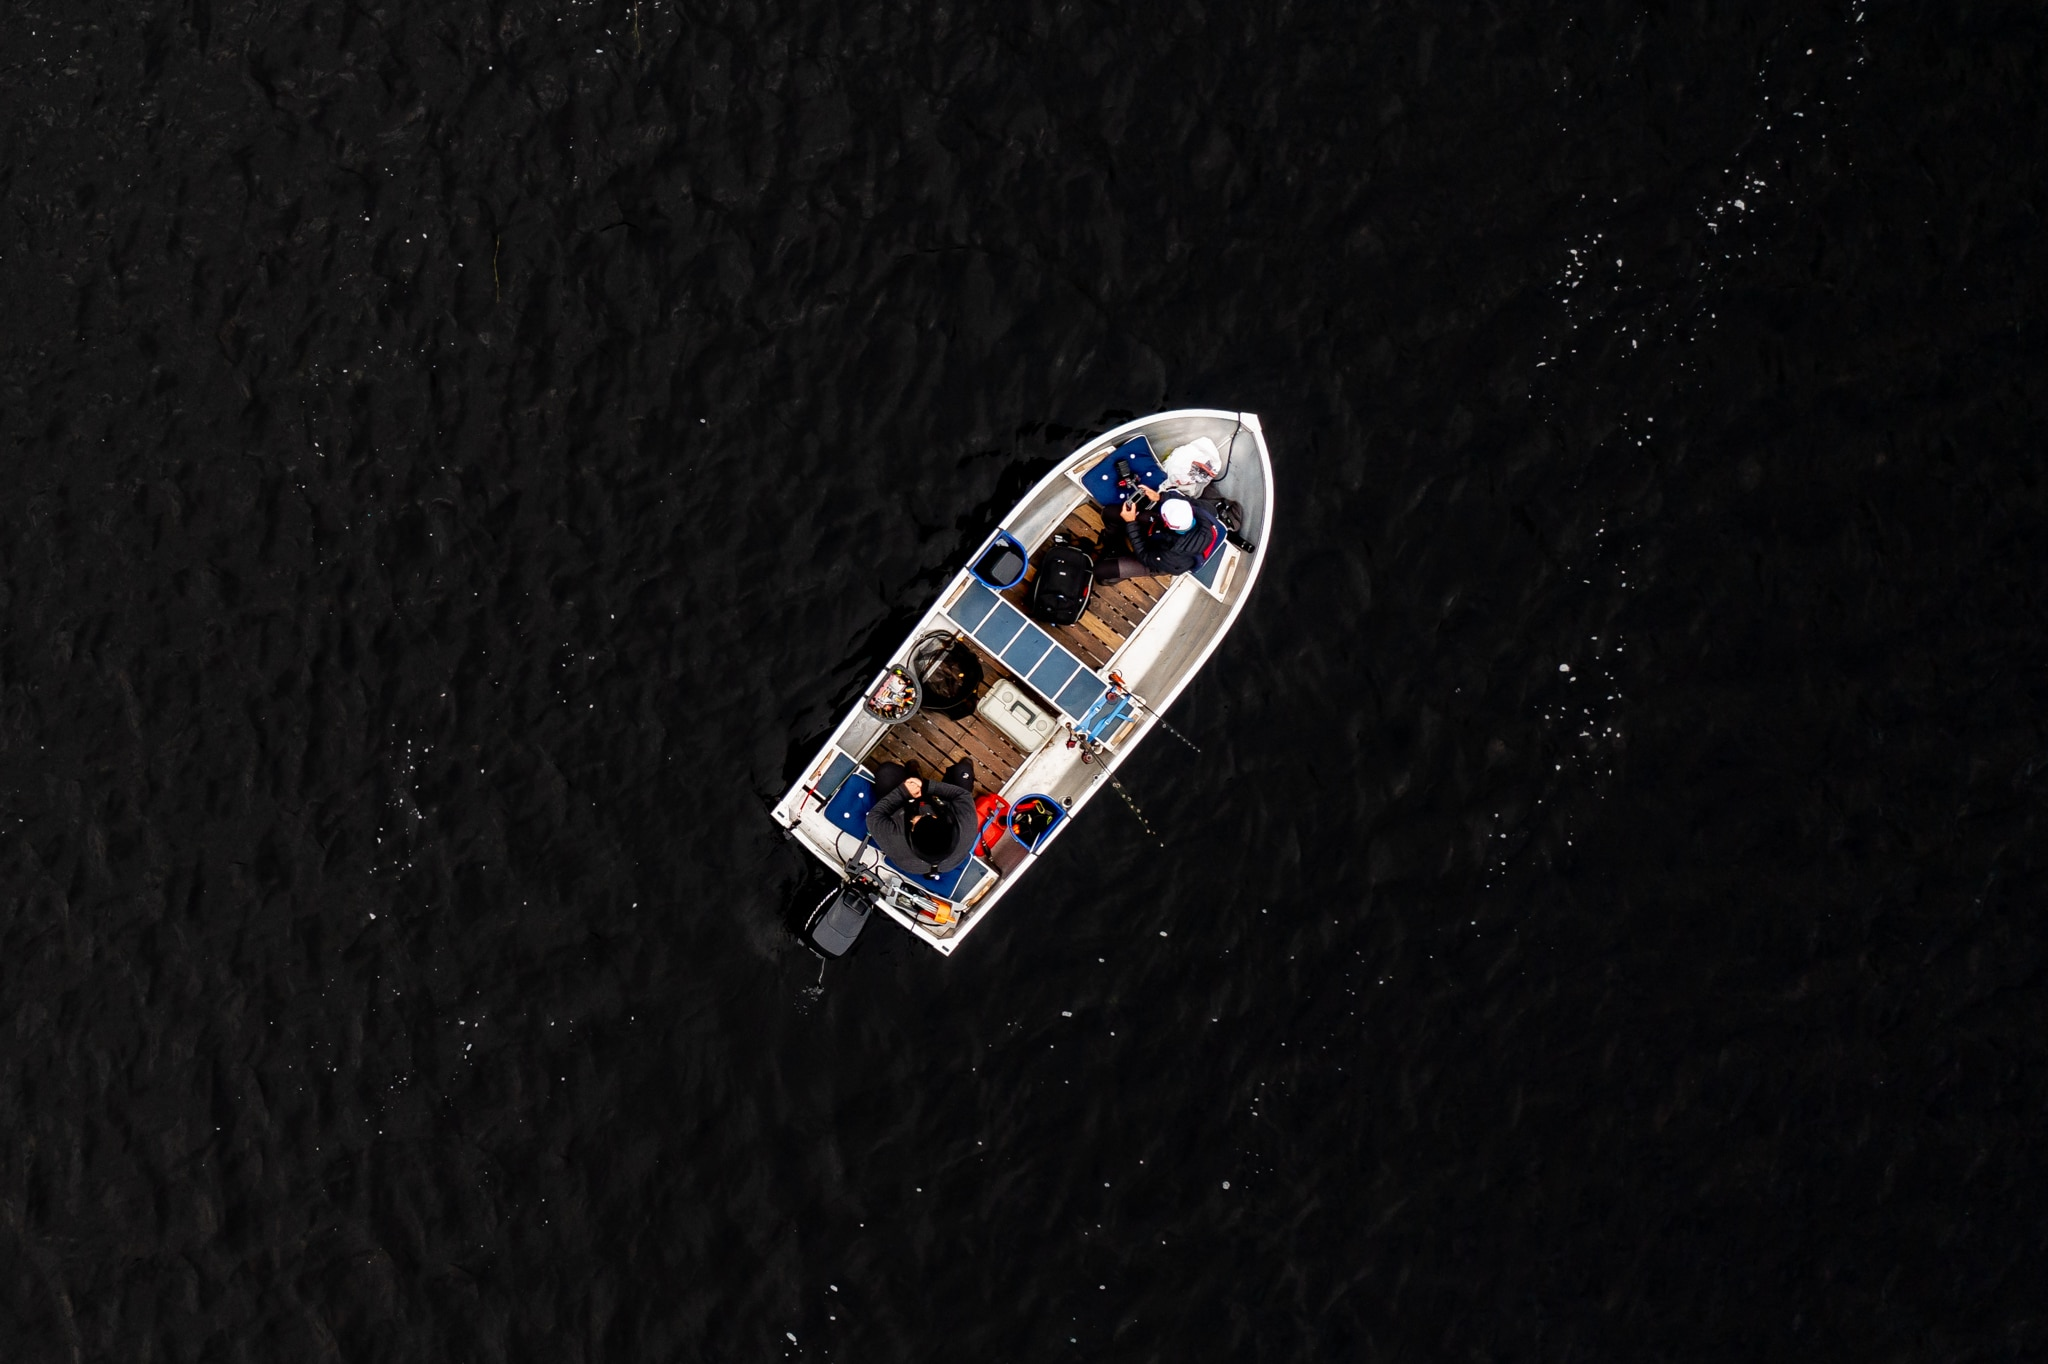 Harrfiske i Härjedalen – Jakten på landskapsfisken Episod 2. Foto: Morgan Grip